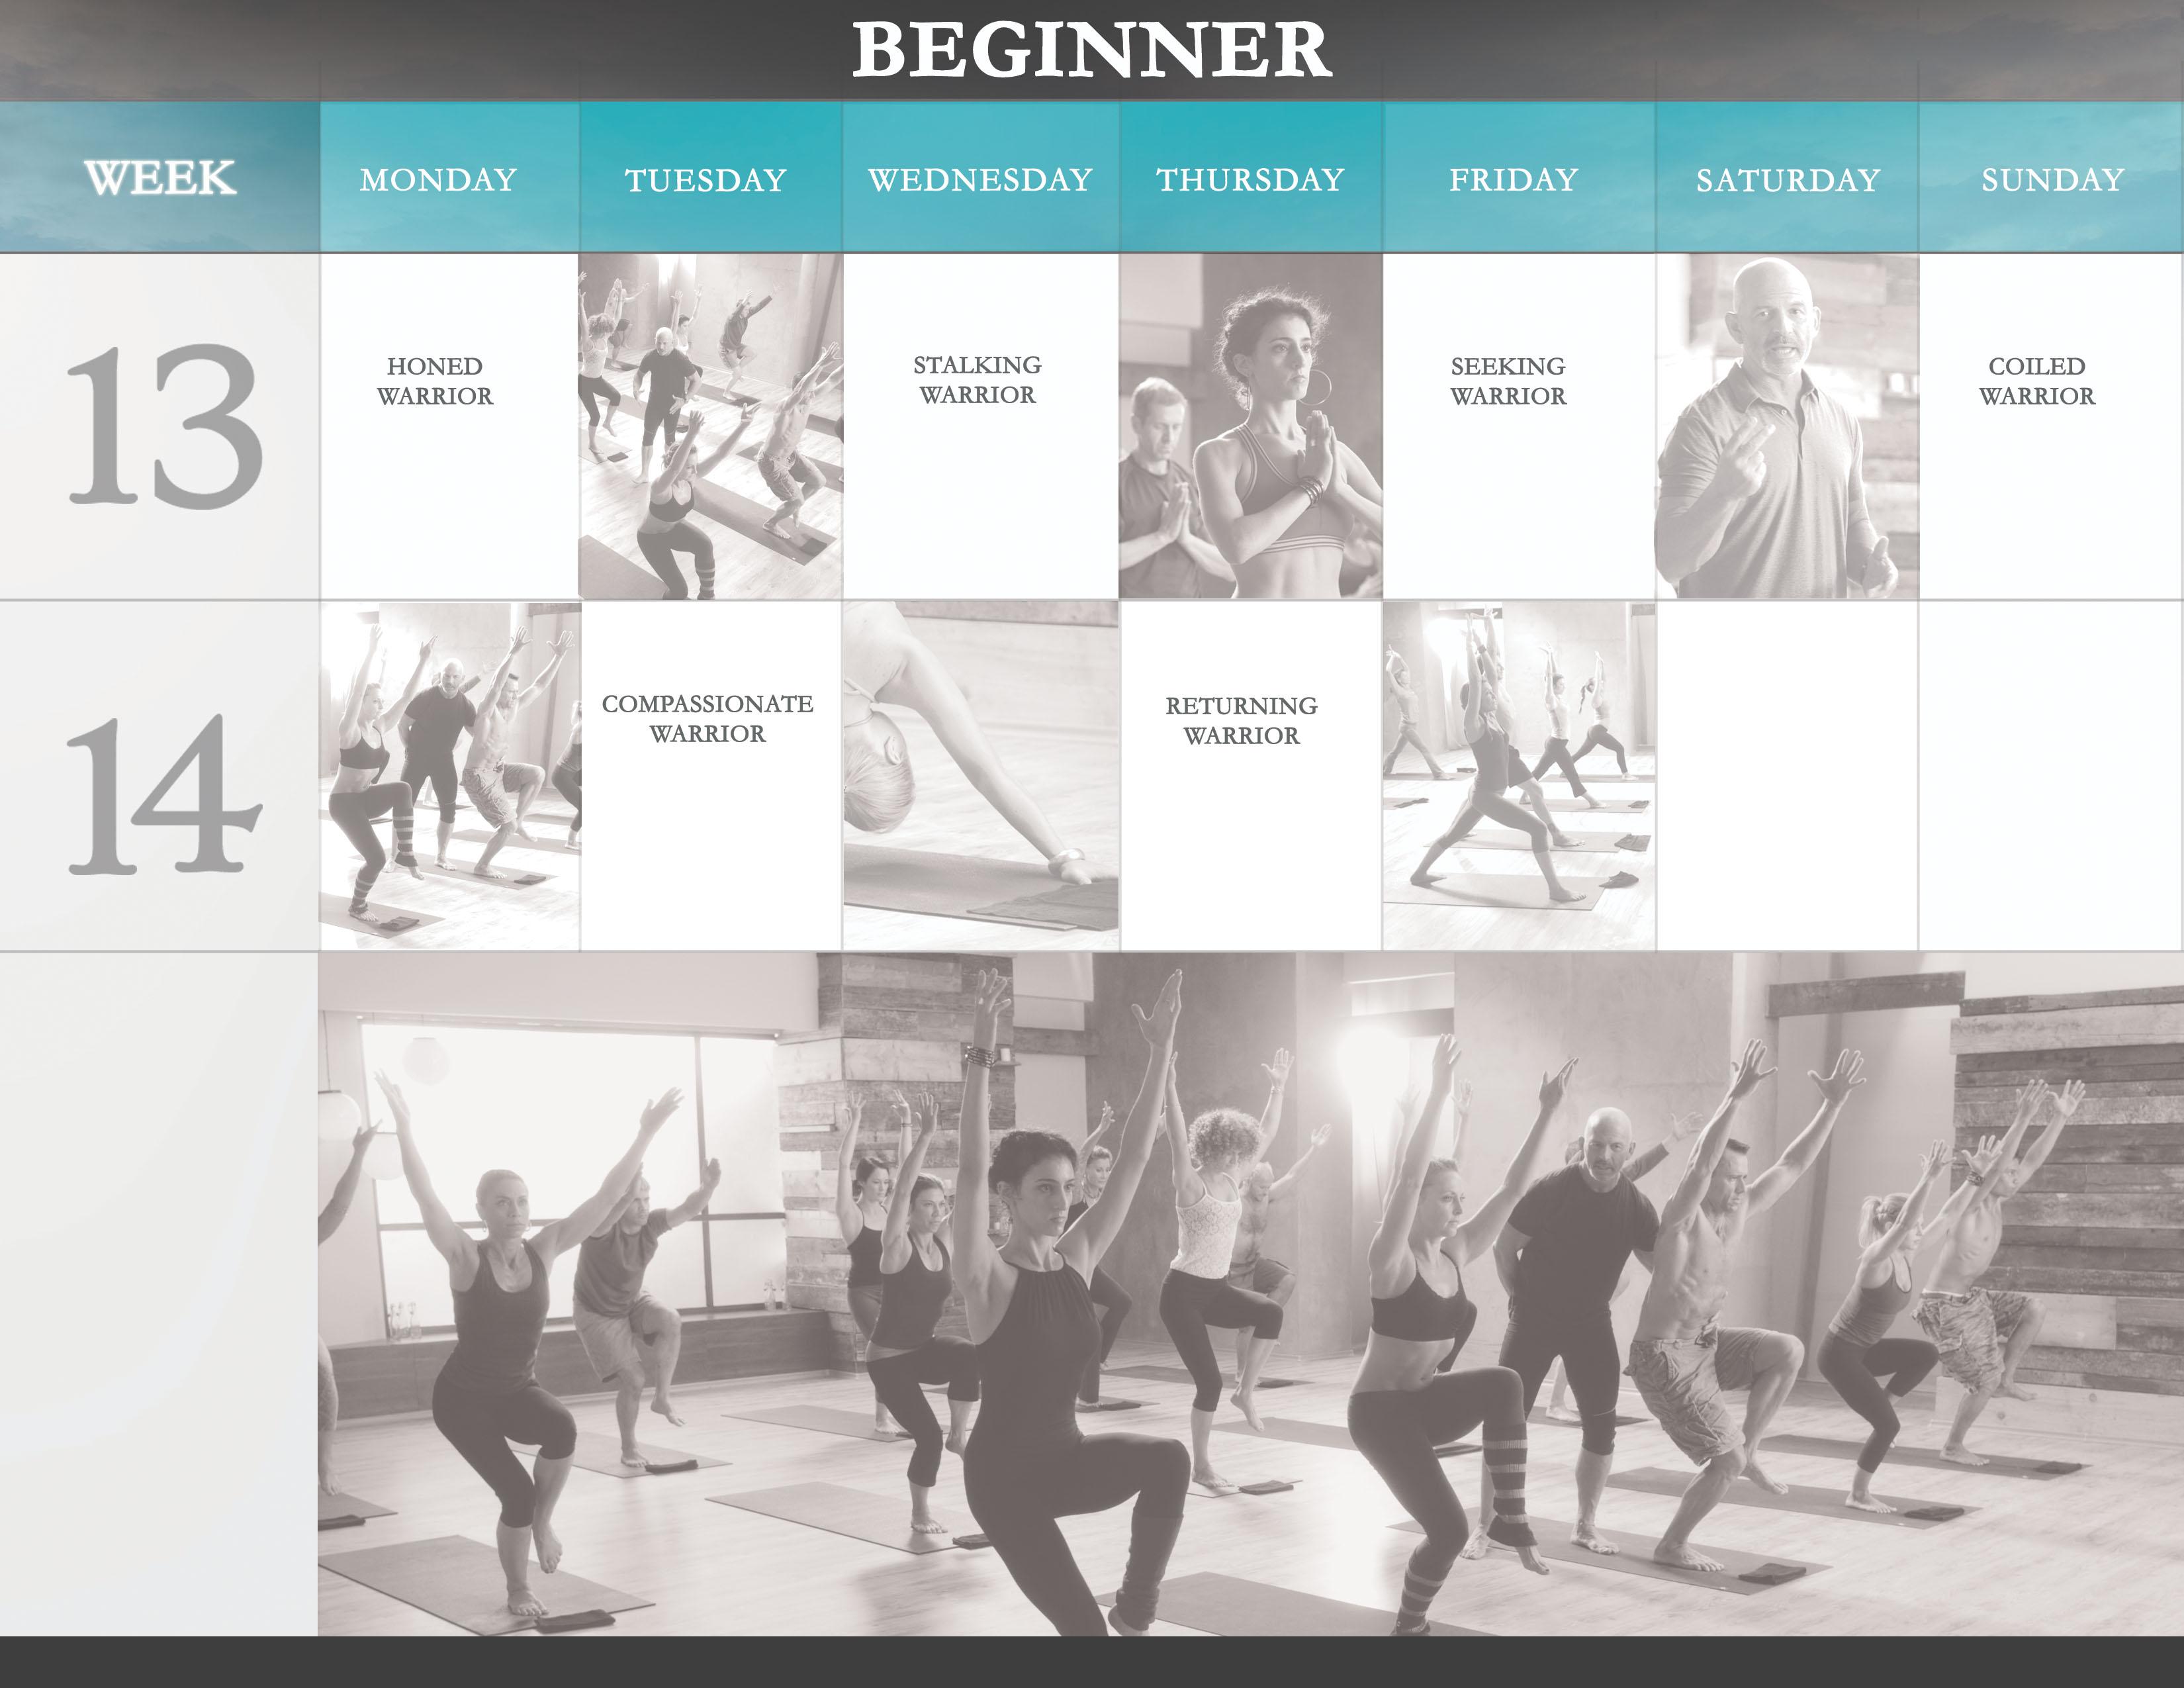 YW_beginner_cal-4